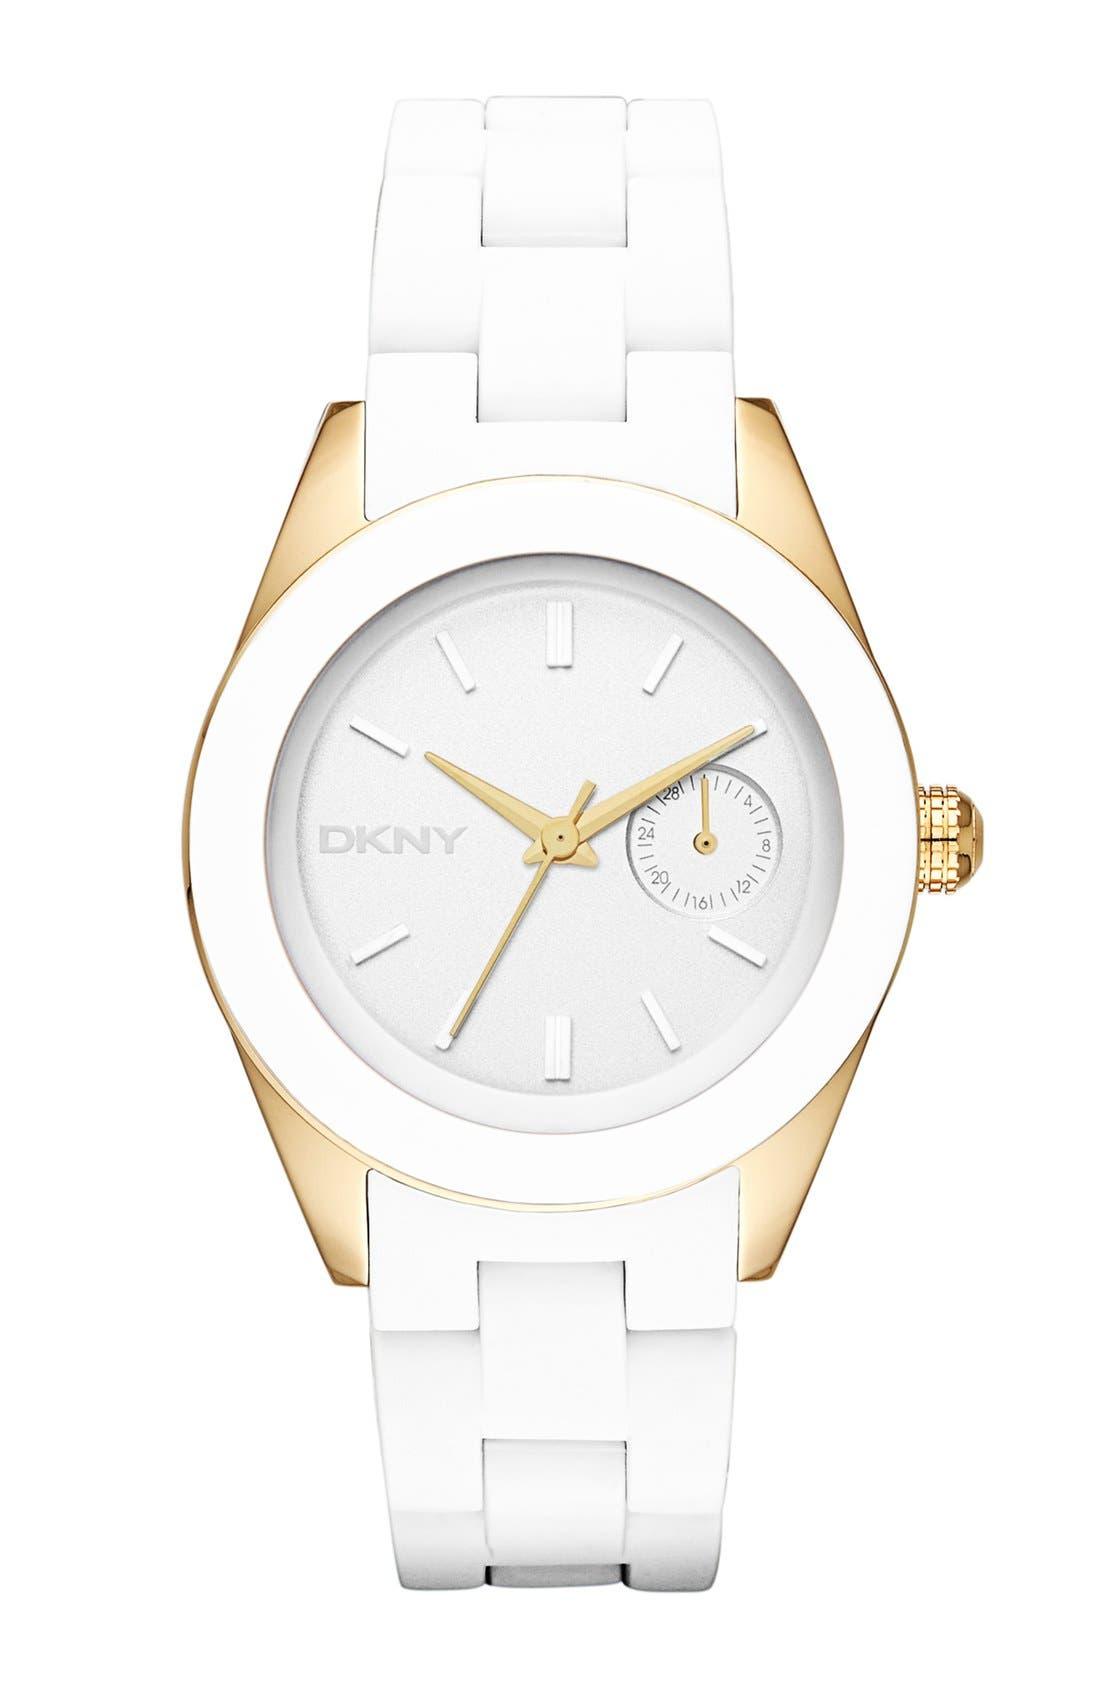 Main Image - DKNY 'Jitney' Round Bracelet Watch, 36mm